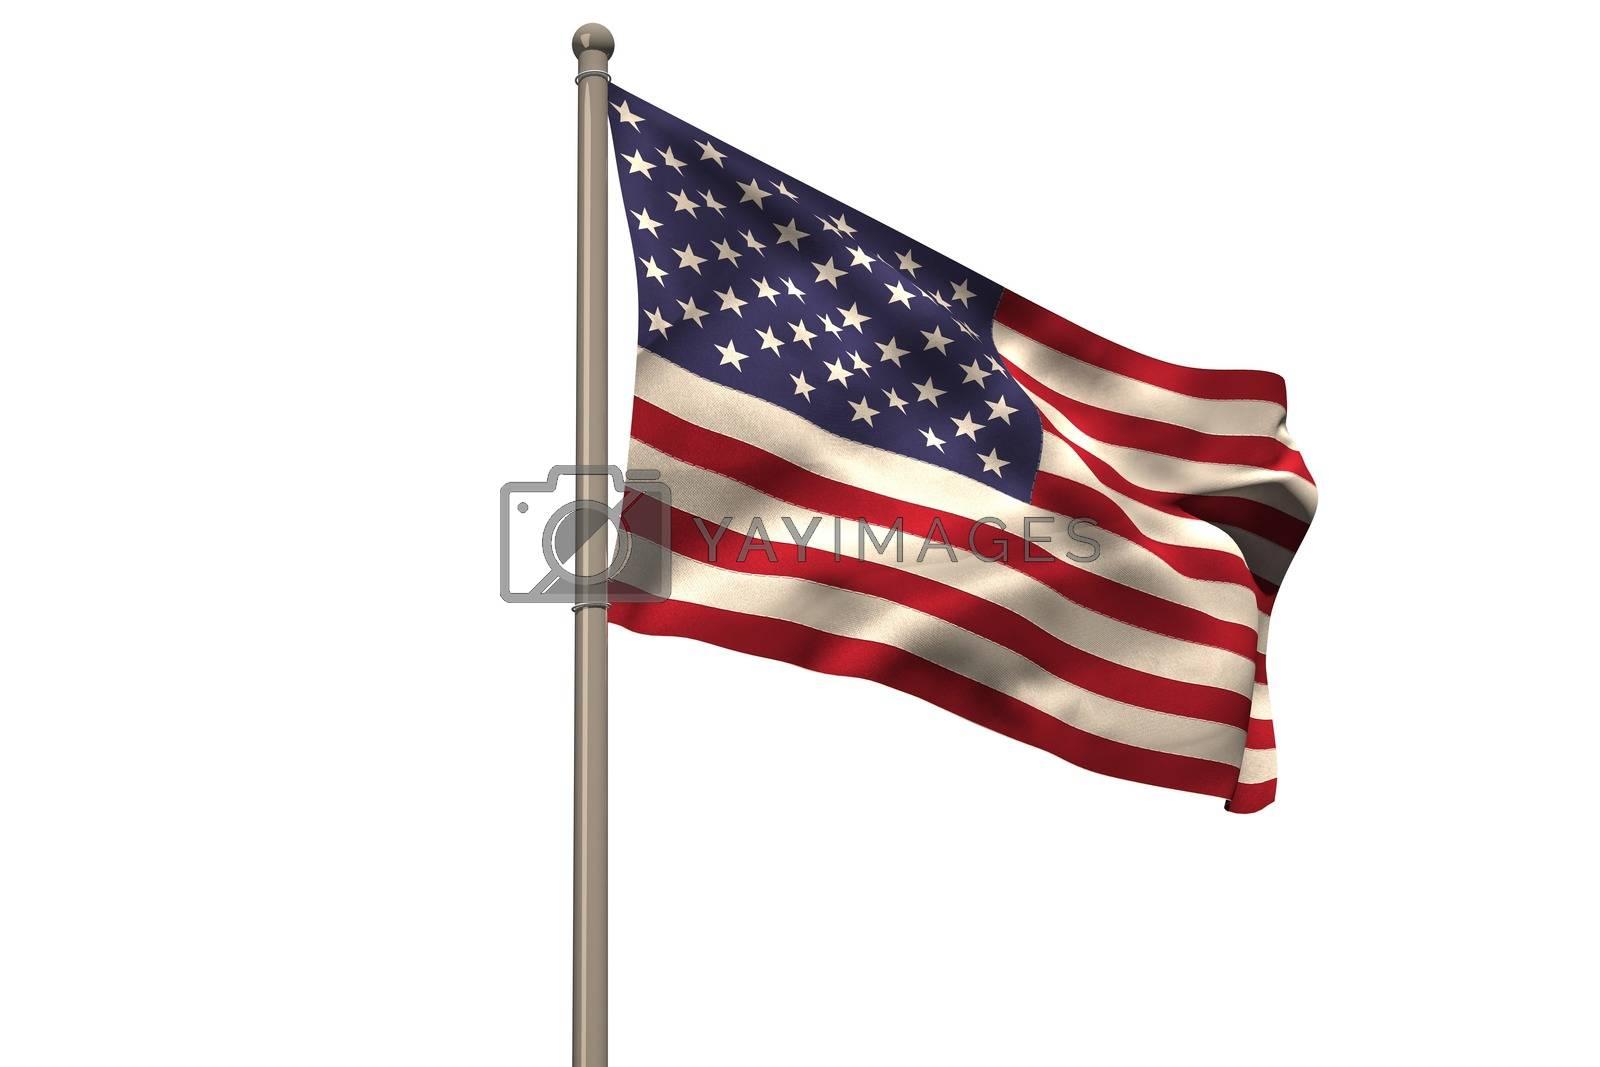 Royalty free image of Digitally generated american national flag by Wavebreakmedia